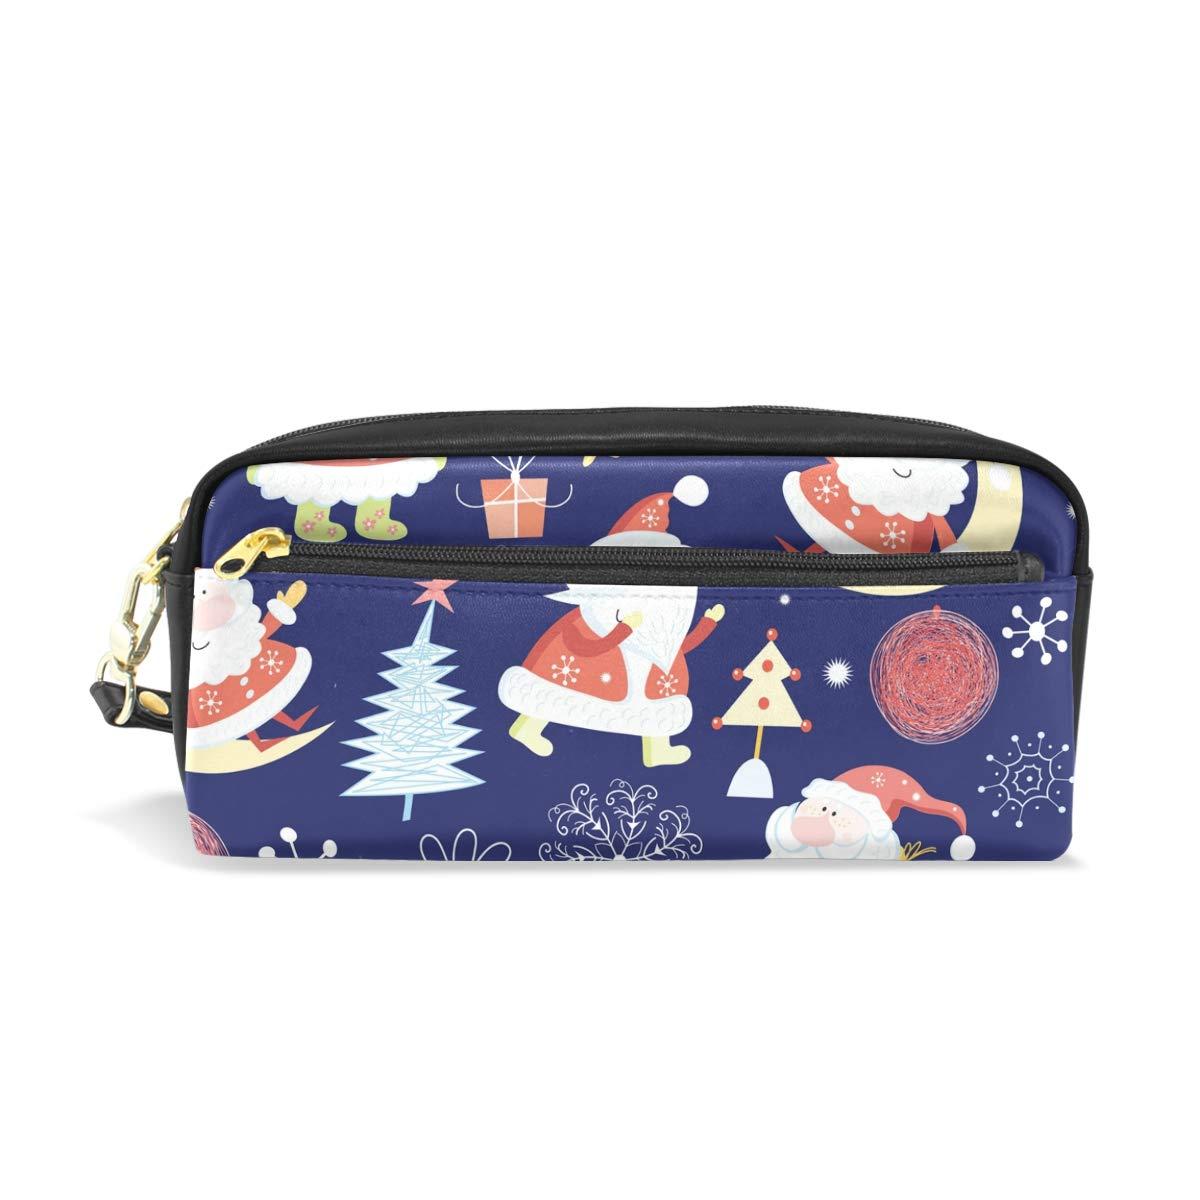 Estuche escolar de Papá Noel, color azul azul azul oscuro, para niños, gran capacidad, bolsa de maquillaje, cosméticos, oficina, bolsa de viaje 477e34